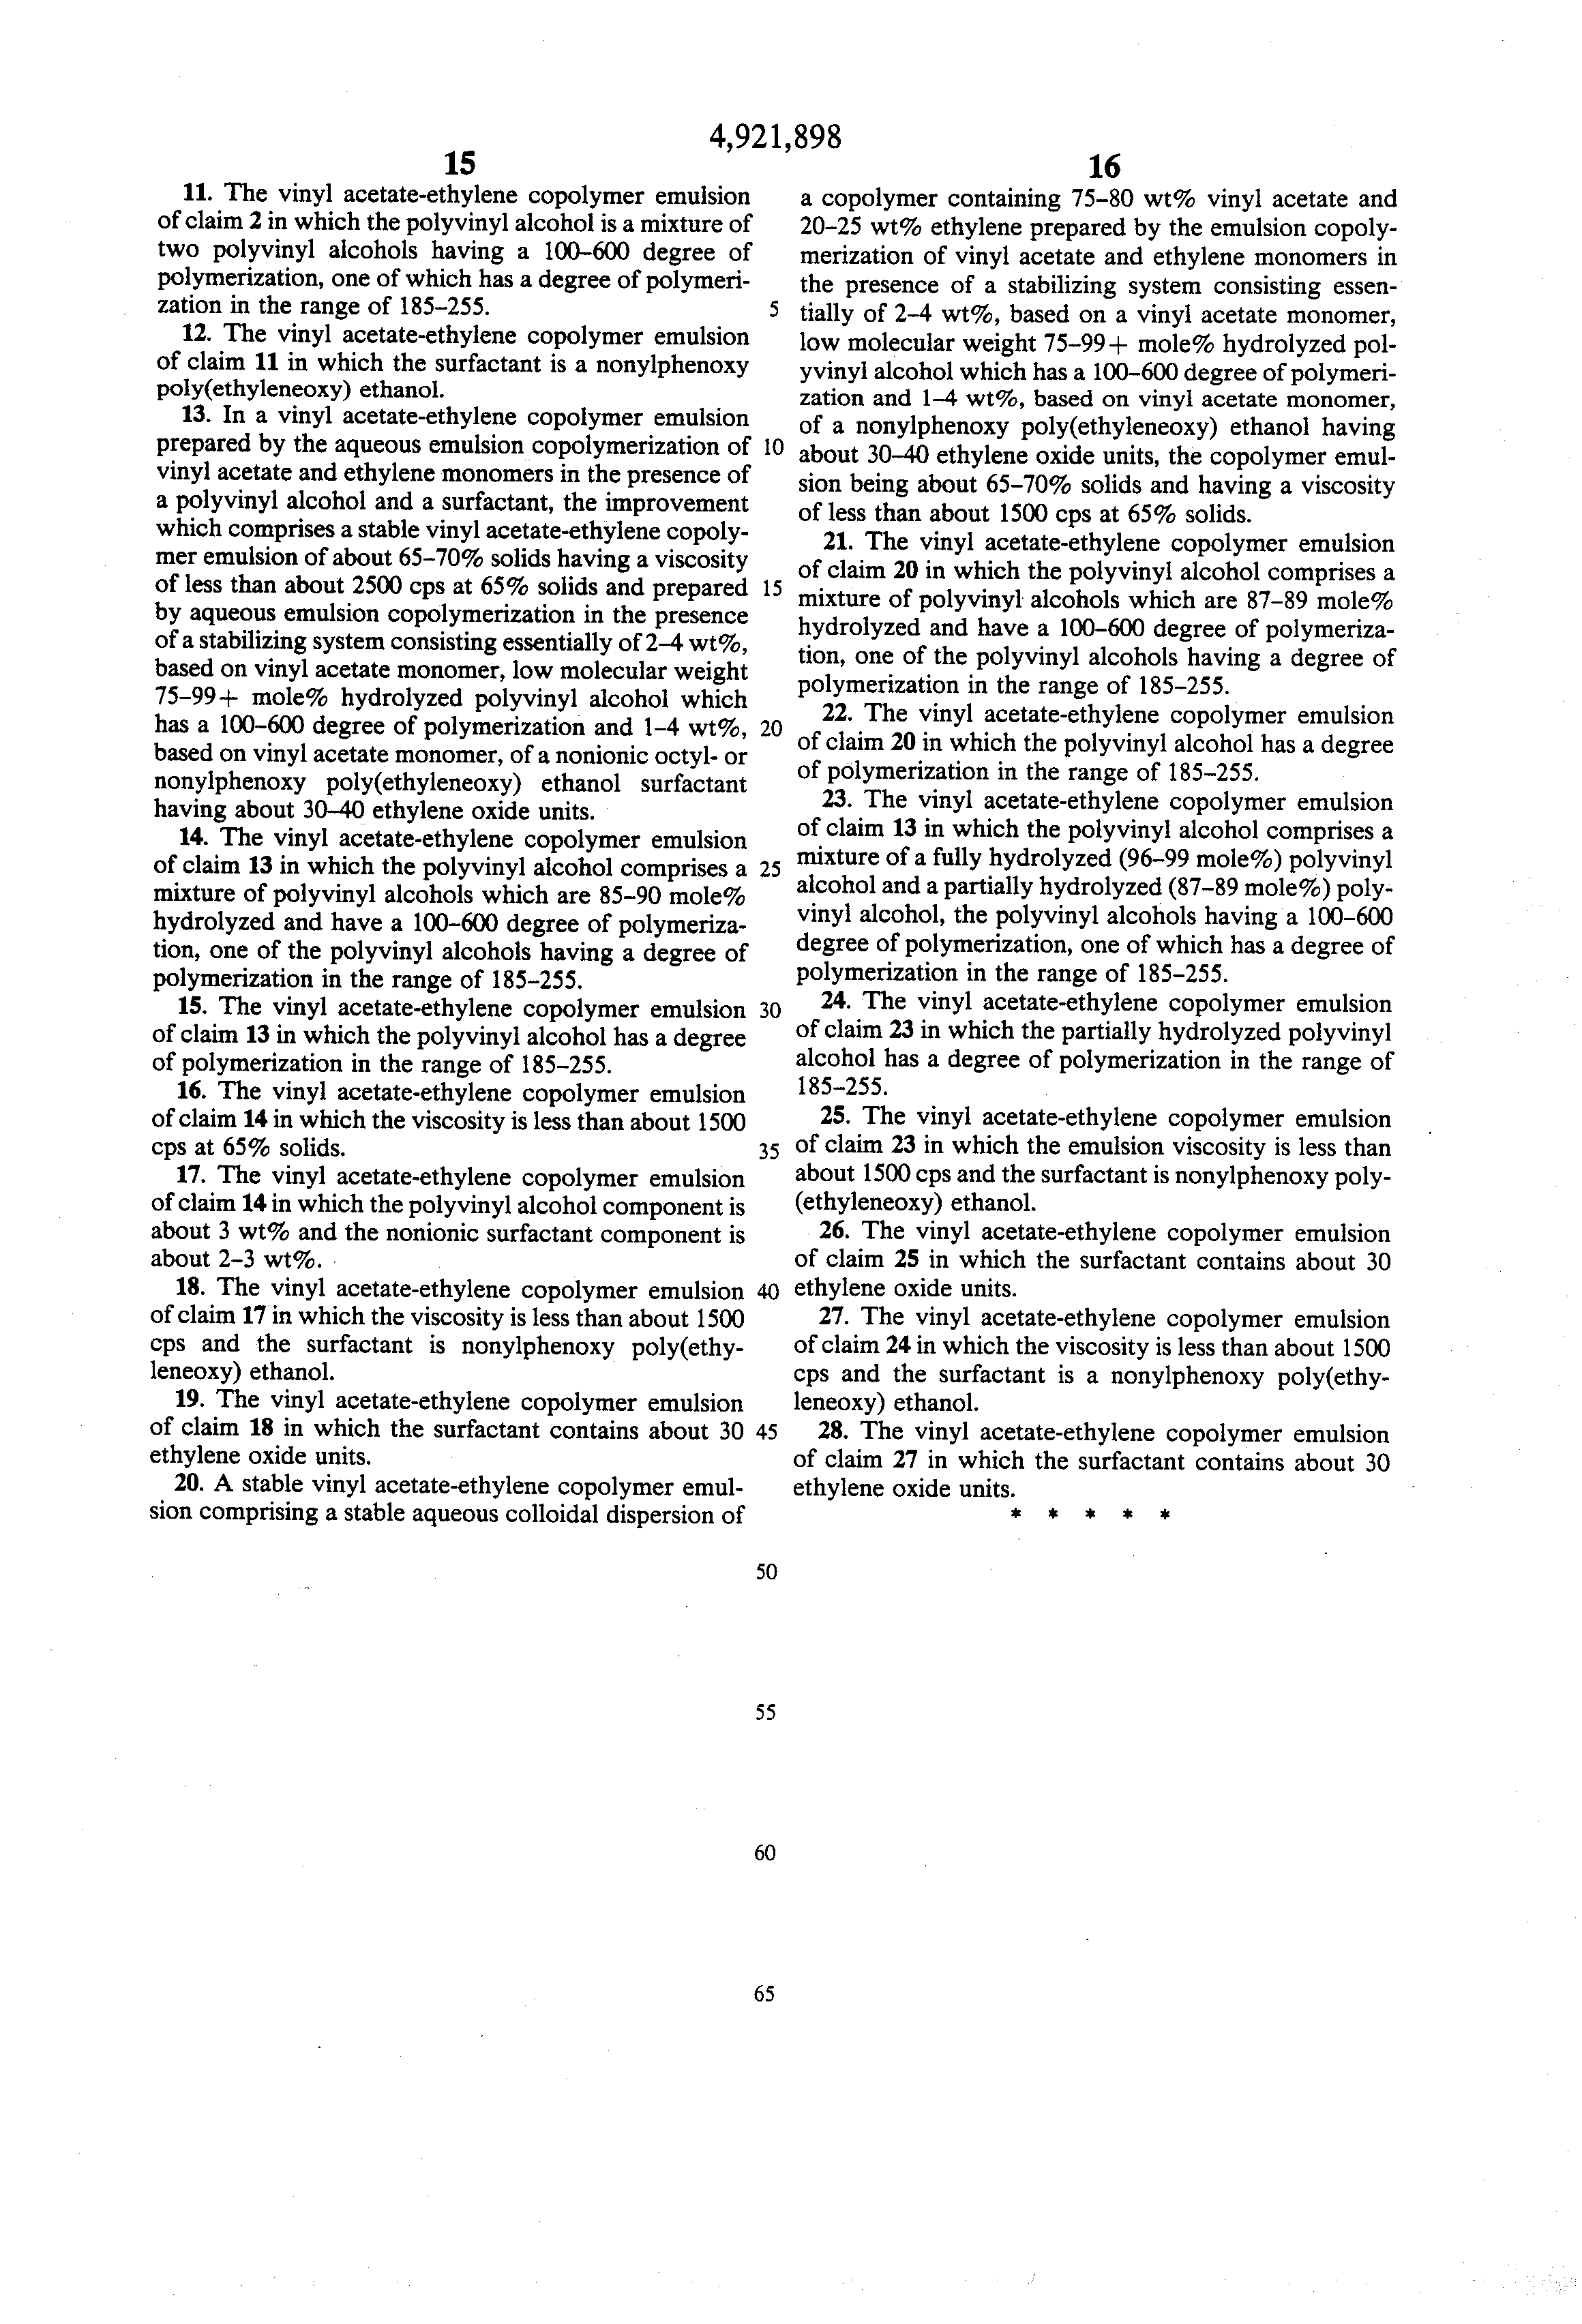 Patent Us4921898 Vinyl Acetate Ethylene Copolymer